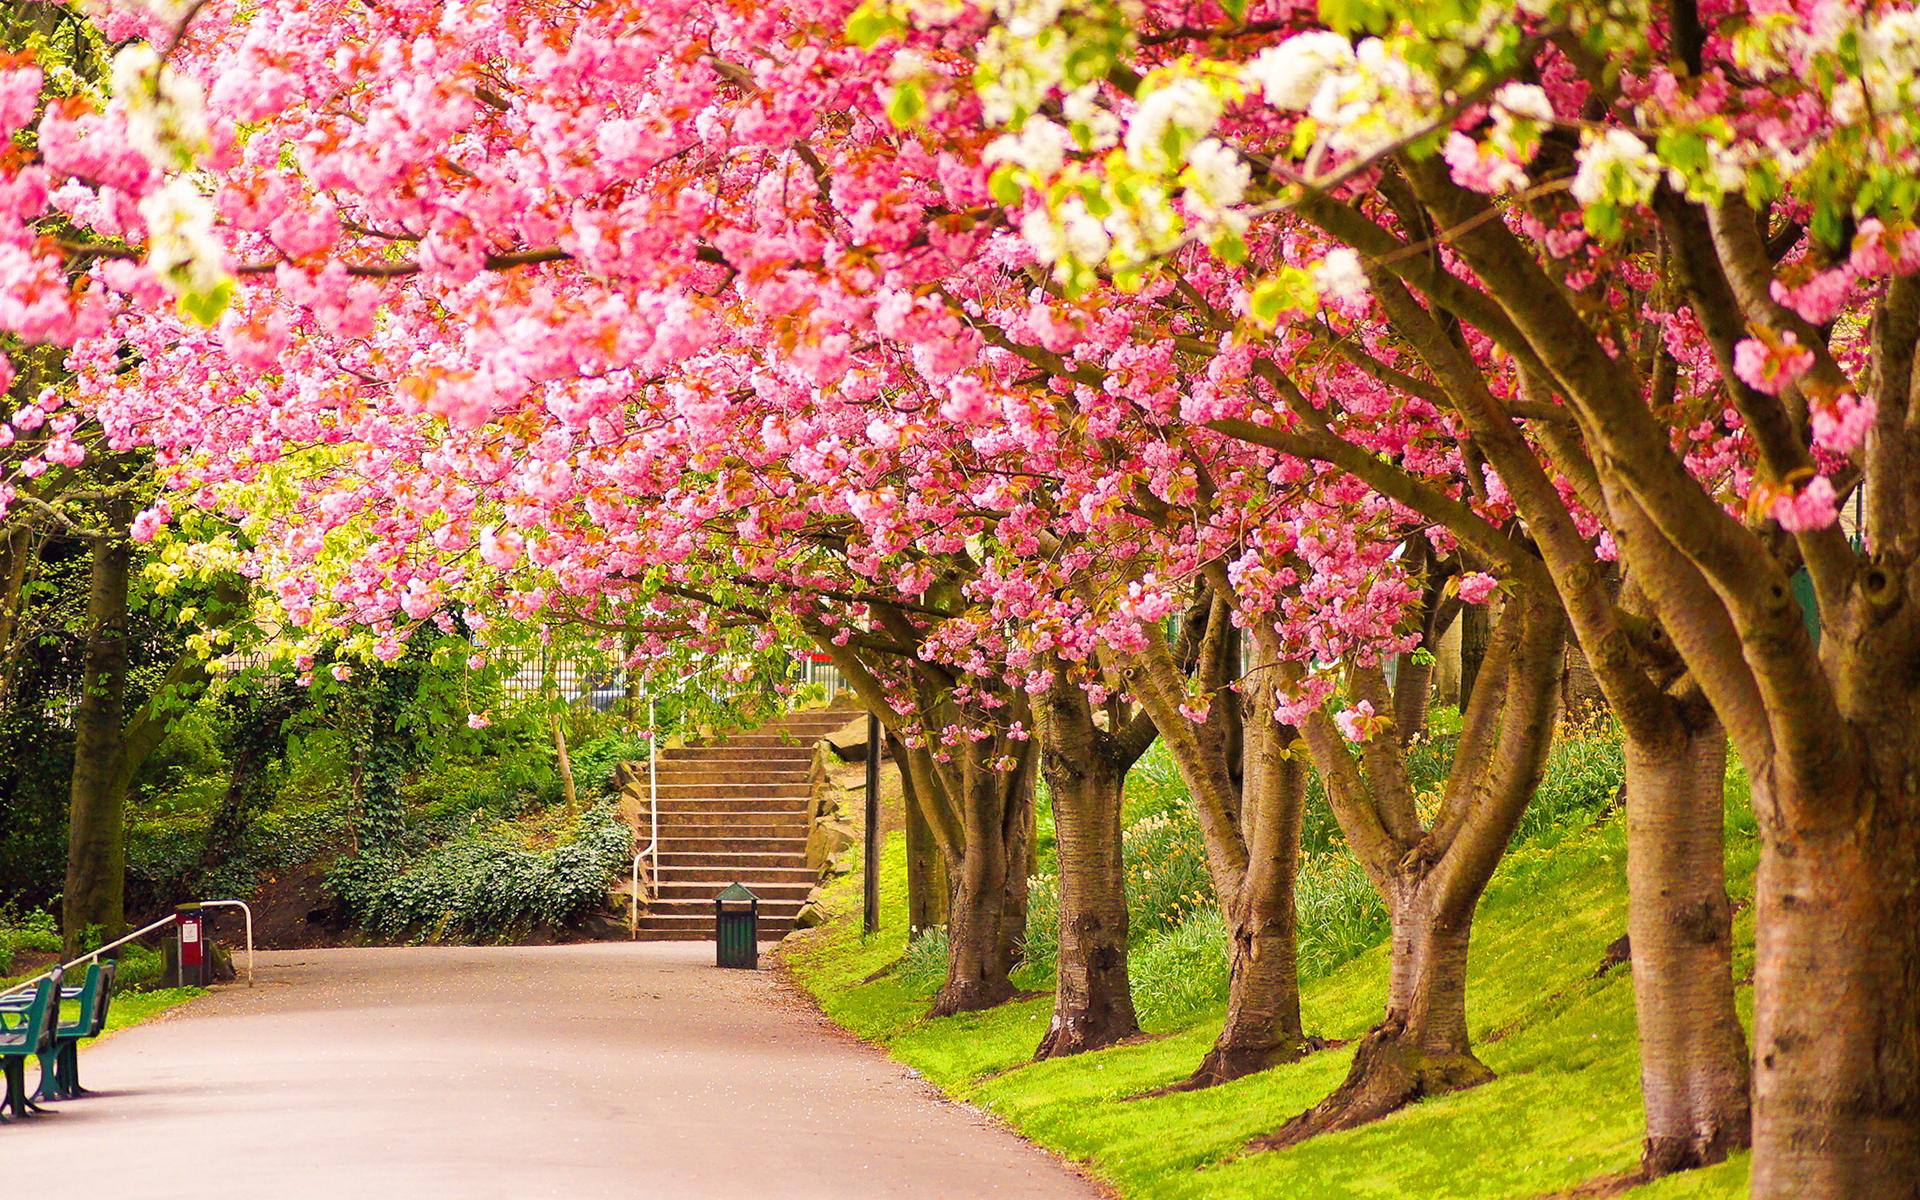 Spring Tree High Definition Wallpaper 25927 - Baltana